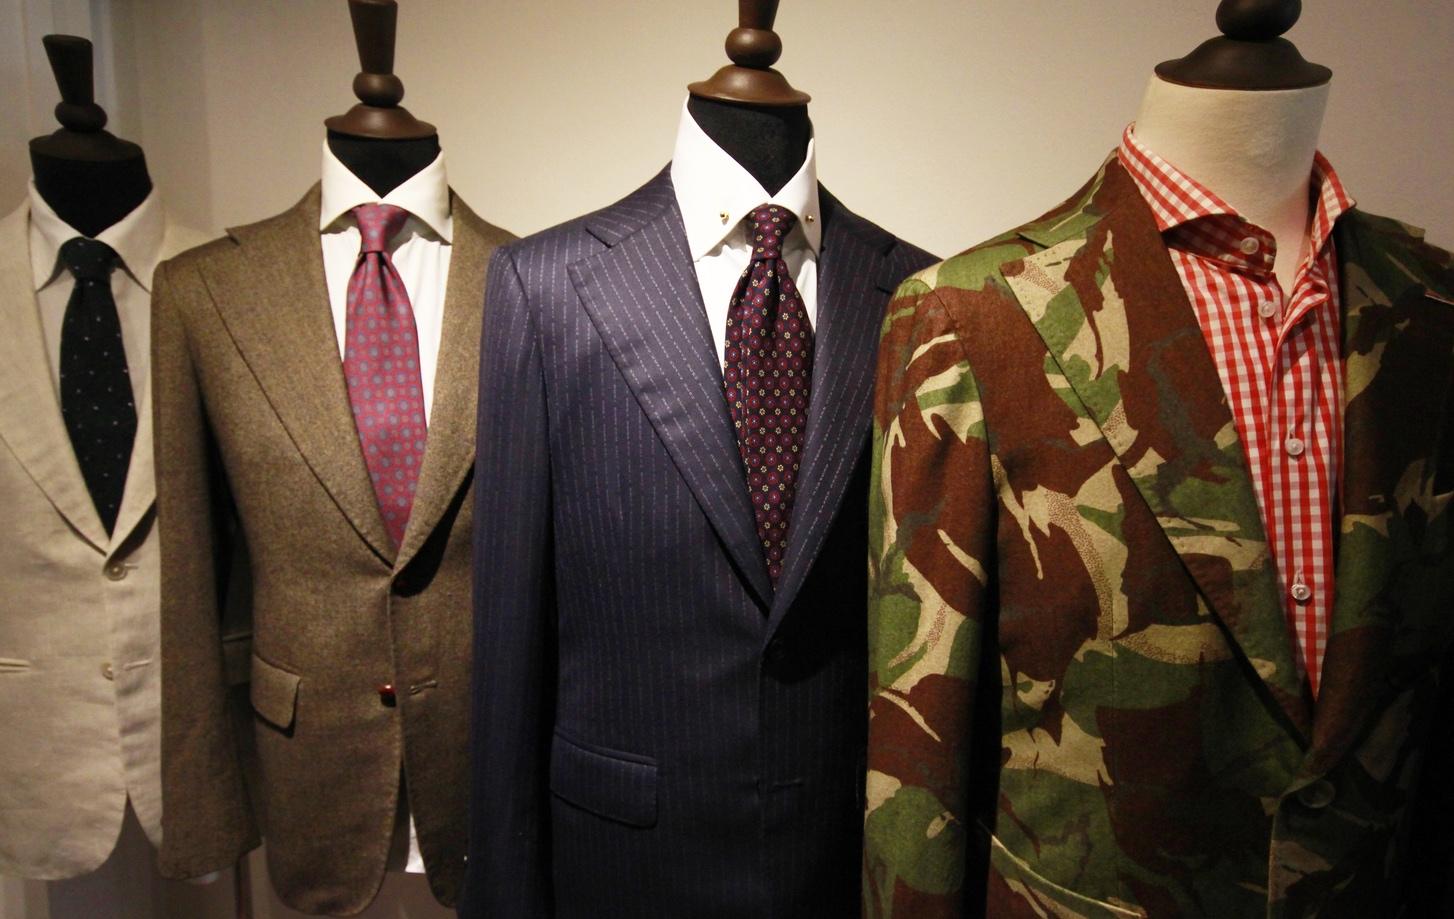 A selection of Kevin Seah bespoke coats.